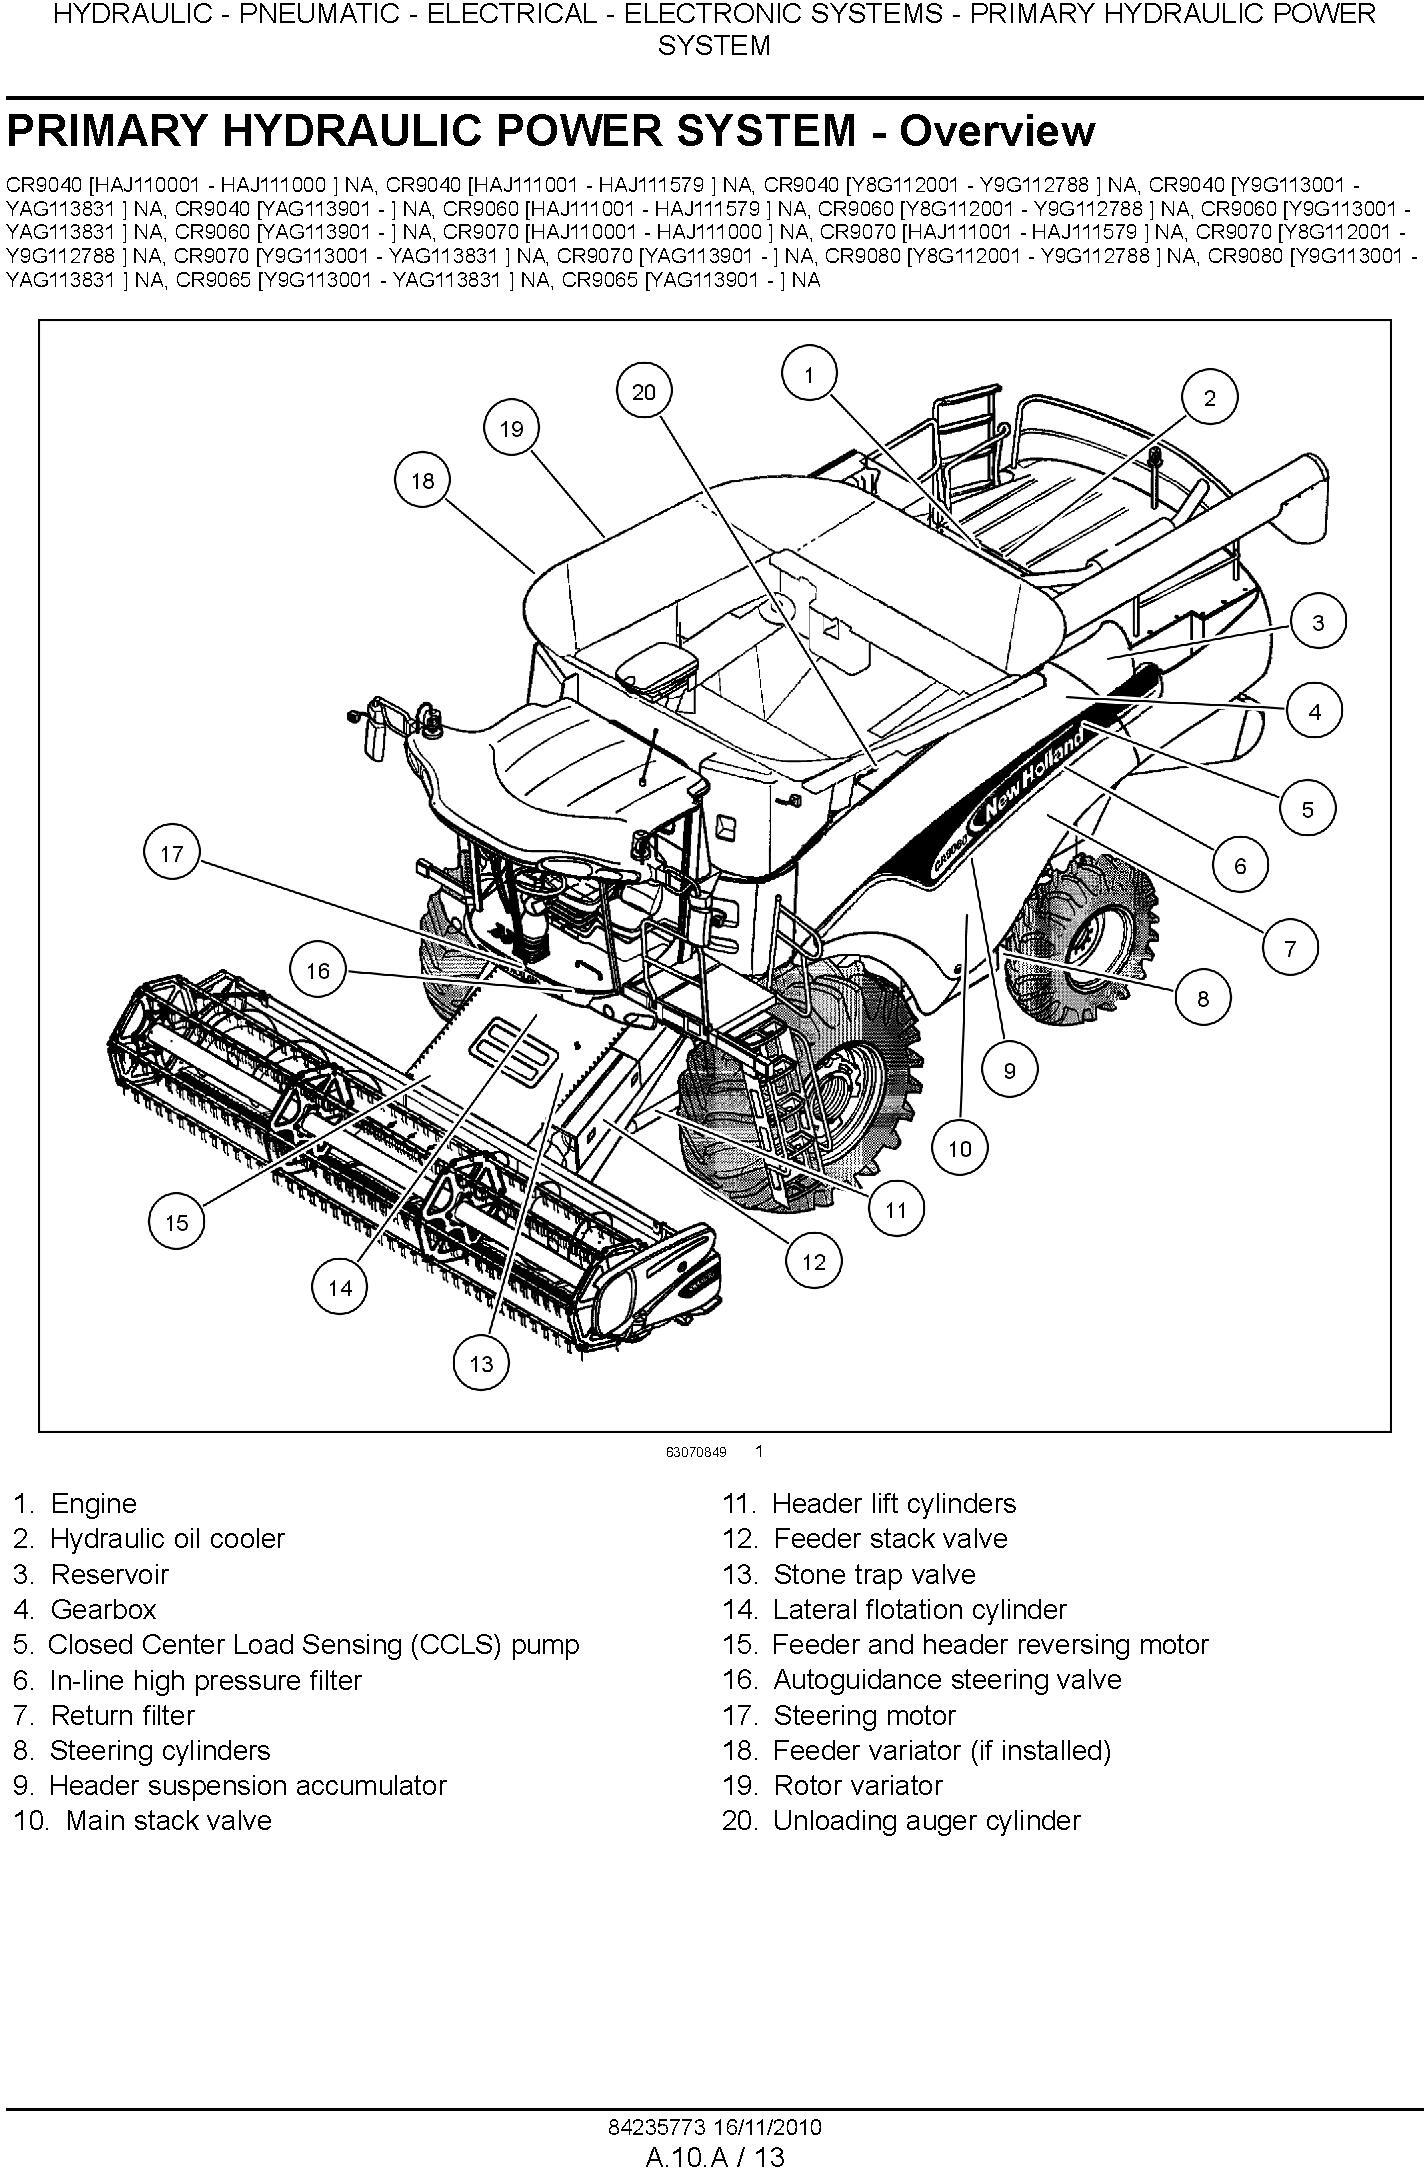 New Holland CR9040, CR9060, CR9065, CR9070, CR9080 Combine (SN. HAJ110001 & Up) Service Manual - 1